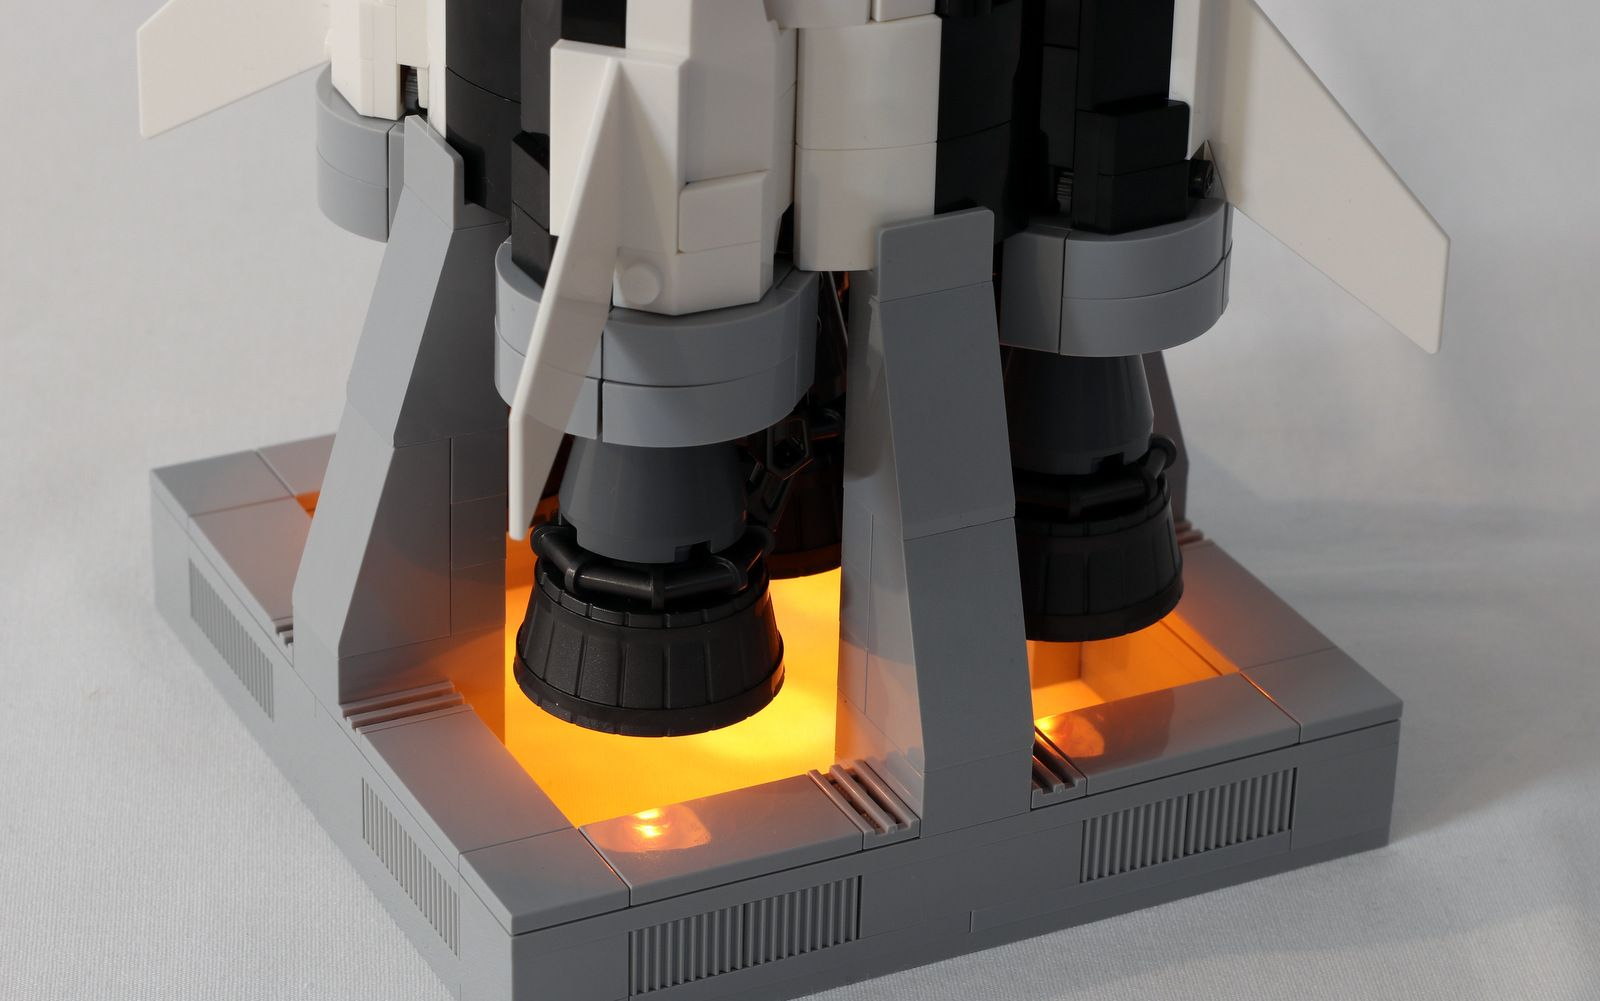 Light And Sound Saturn V Jk Brickworks Lego Lego Projects Lego Plane